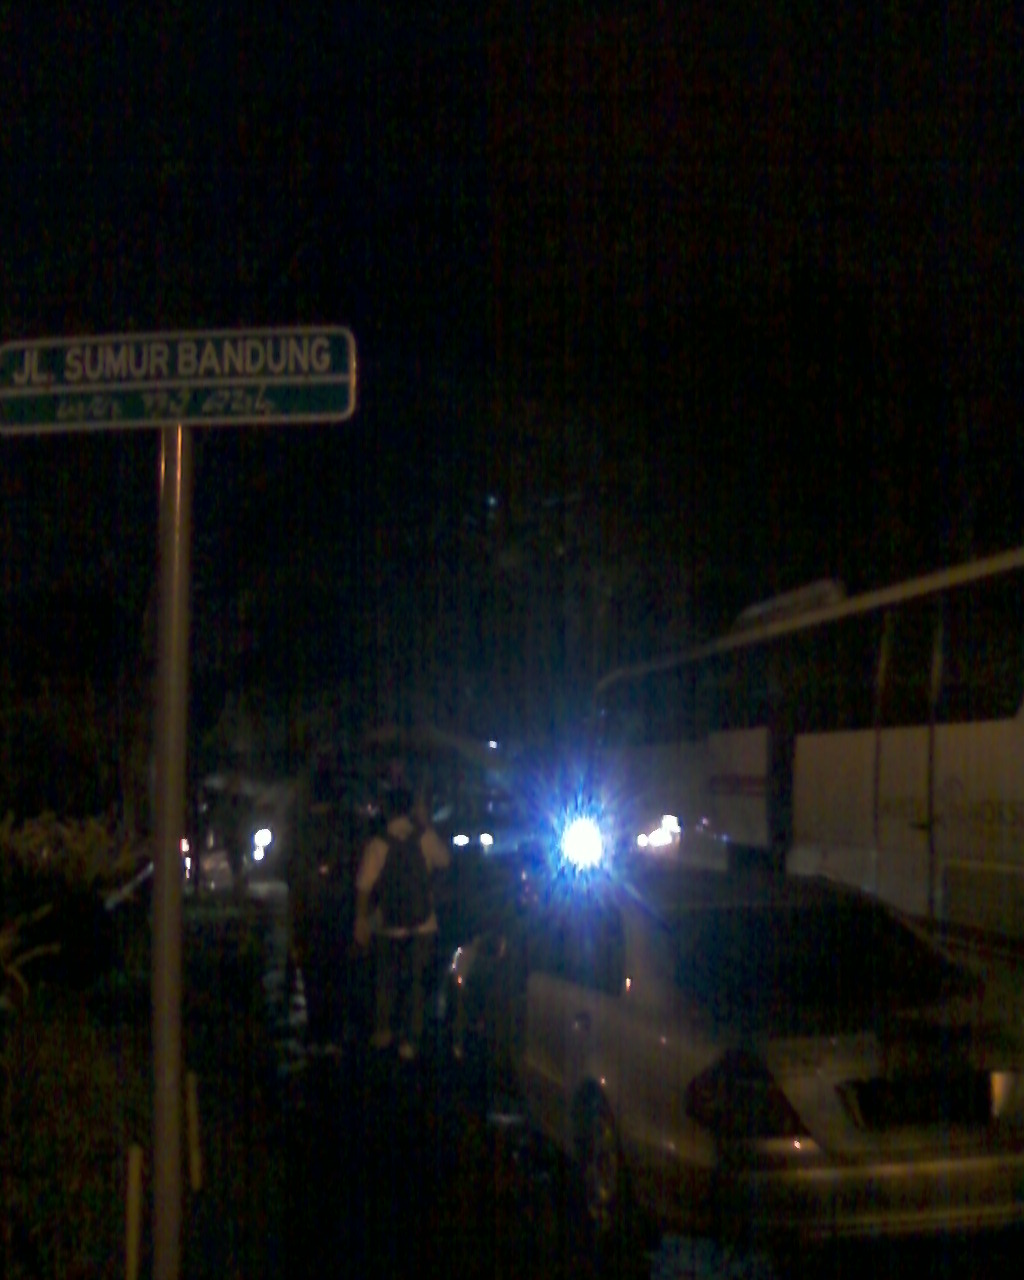 Jalan Sumur Bandung Macet Euy